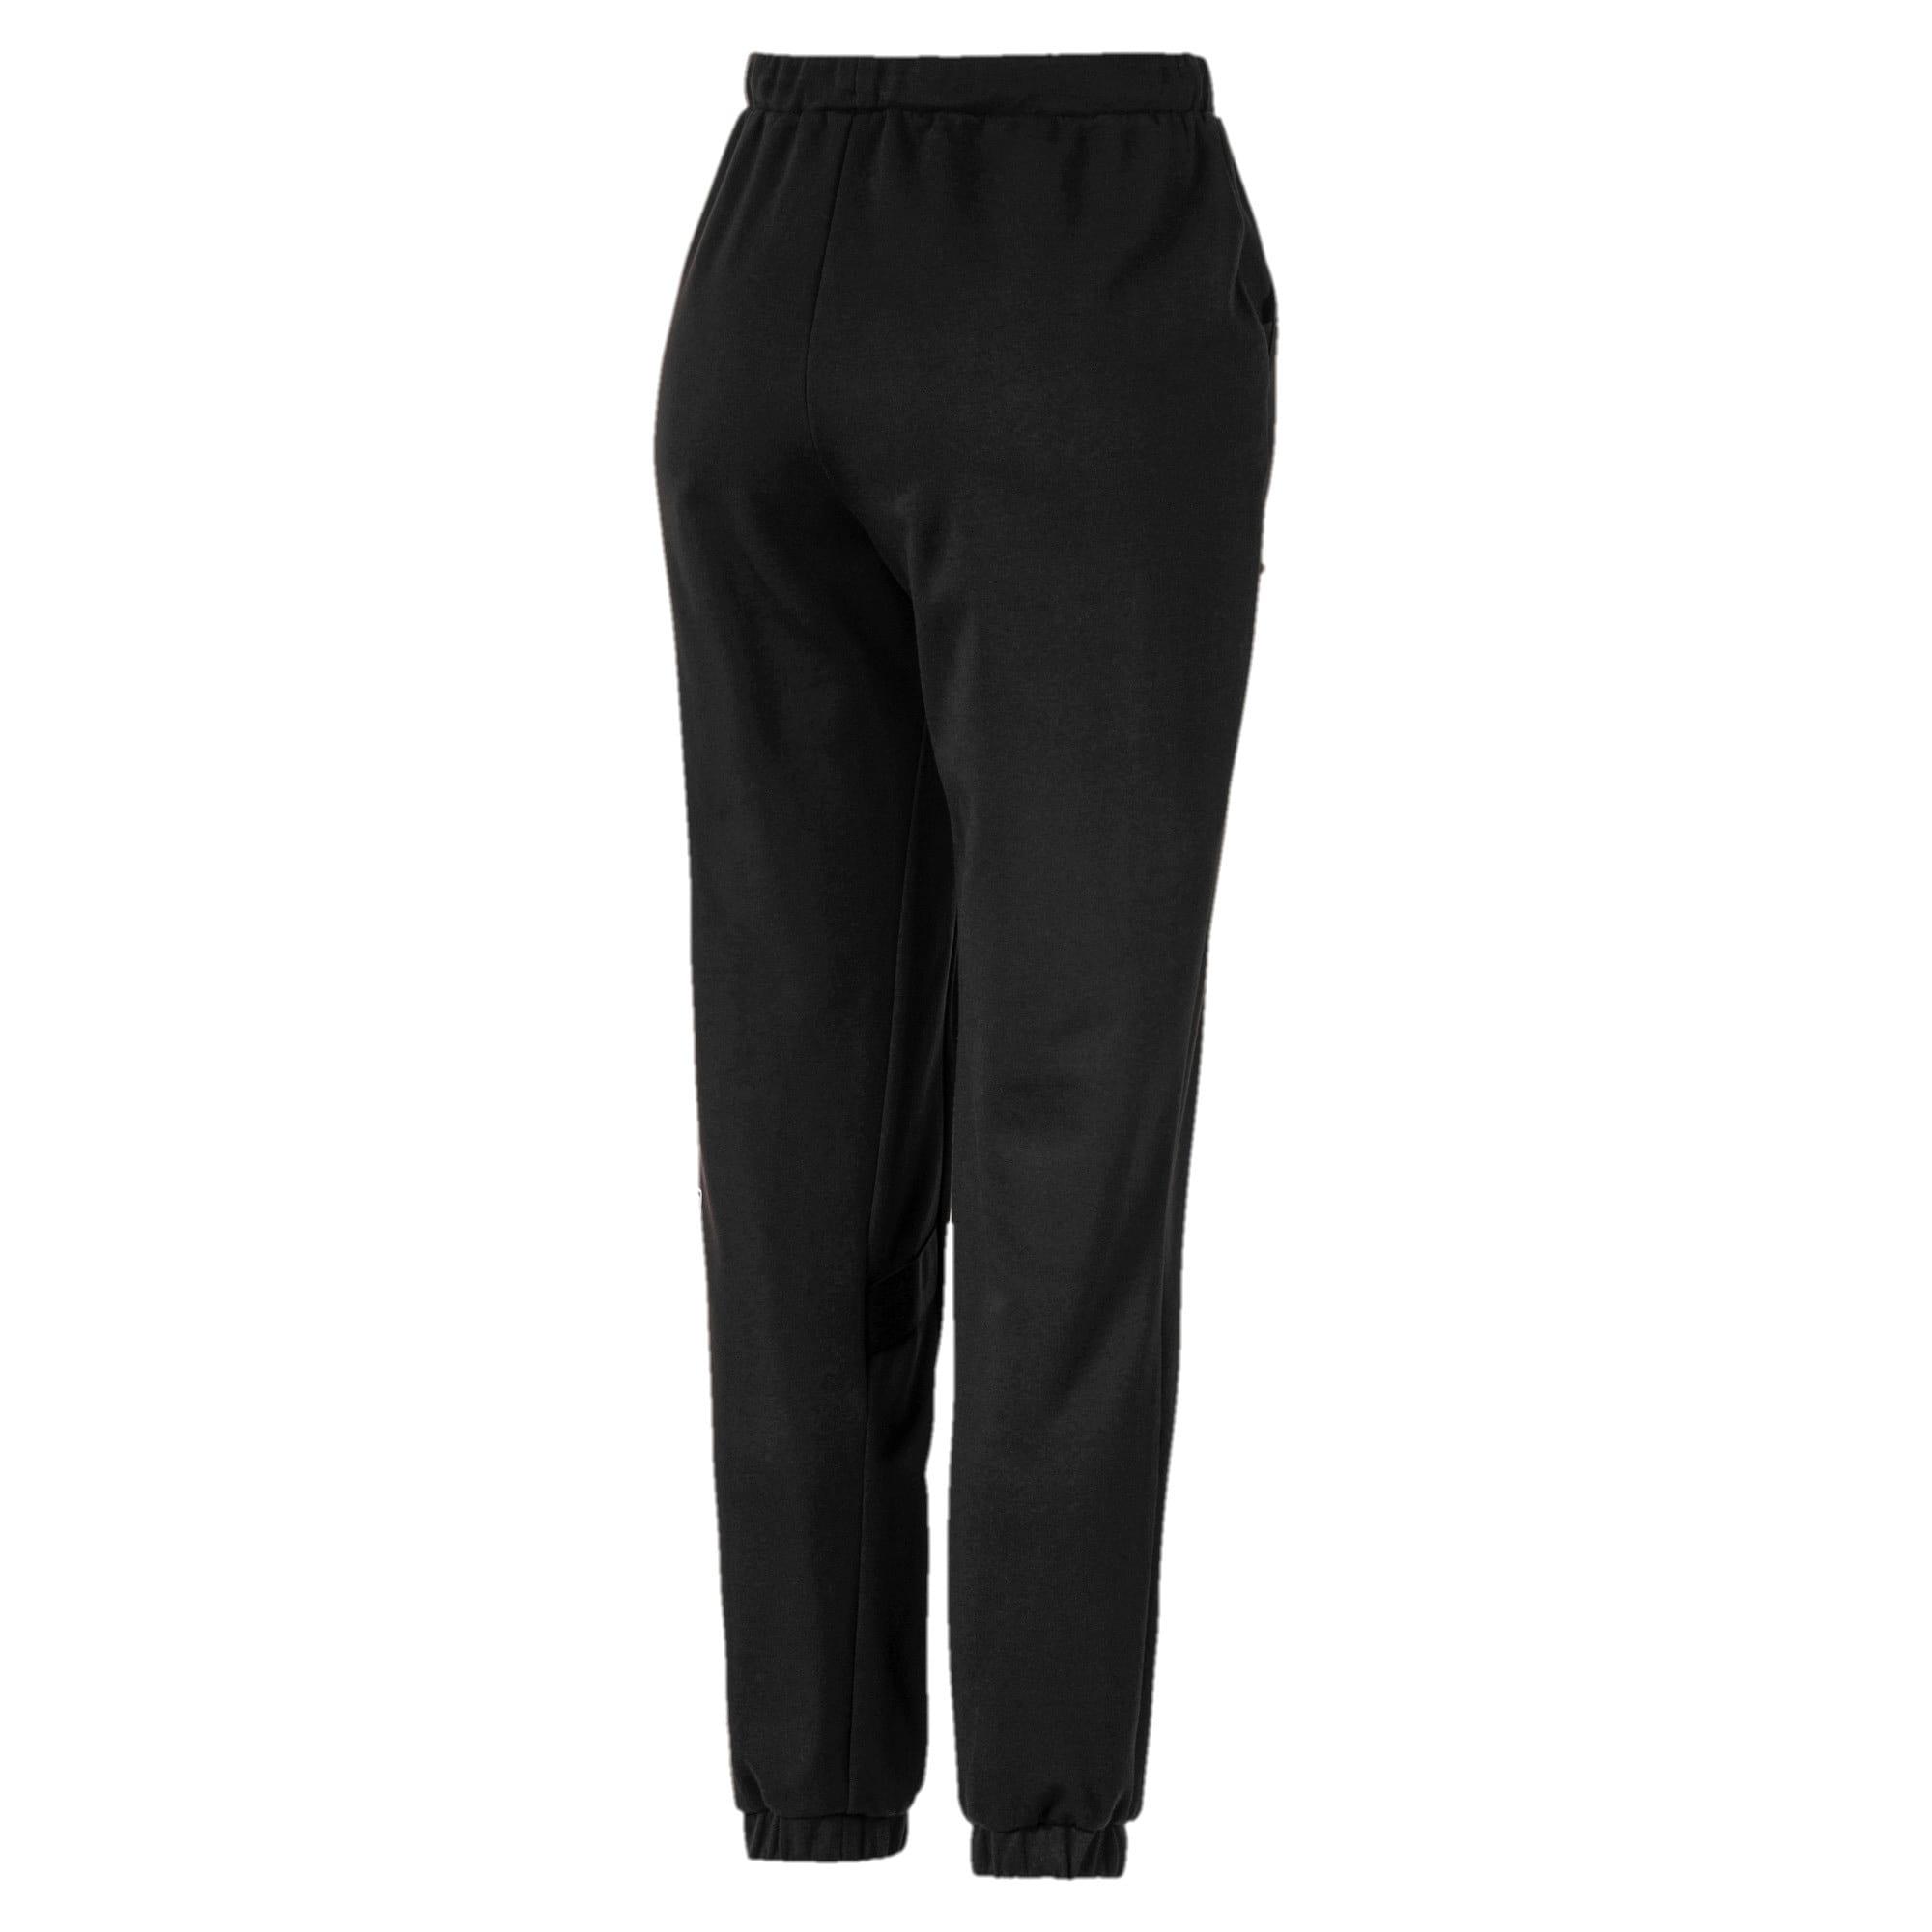 Thumbnail 5 of HIT Feel It Knitted Women's Training Sweatpants, Puma Black, medium-IND